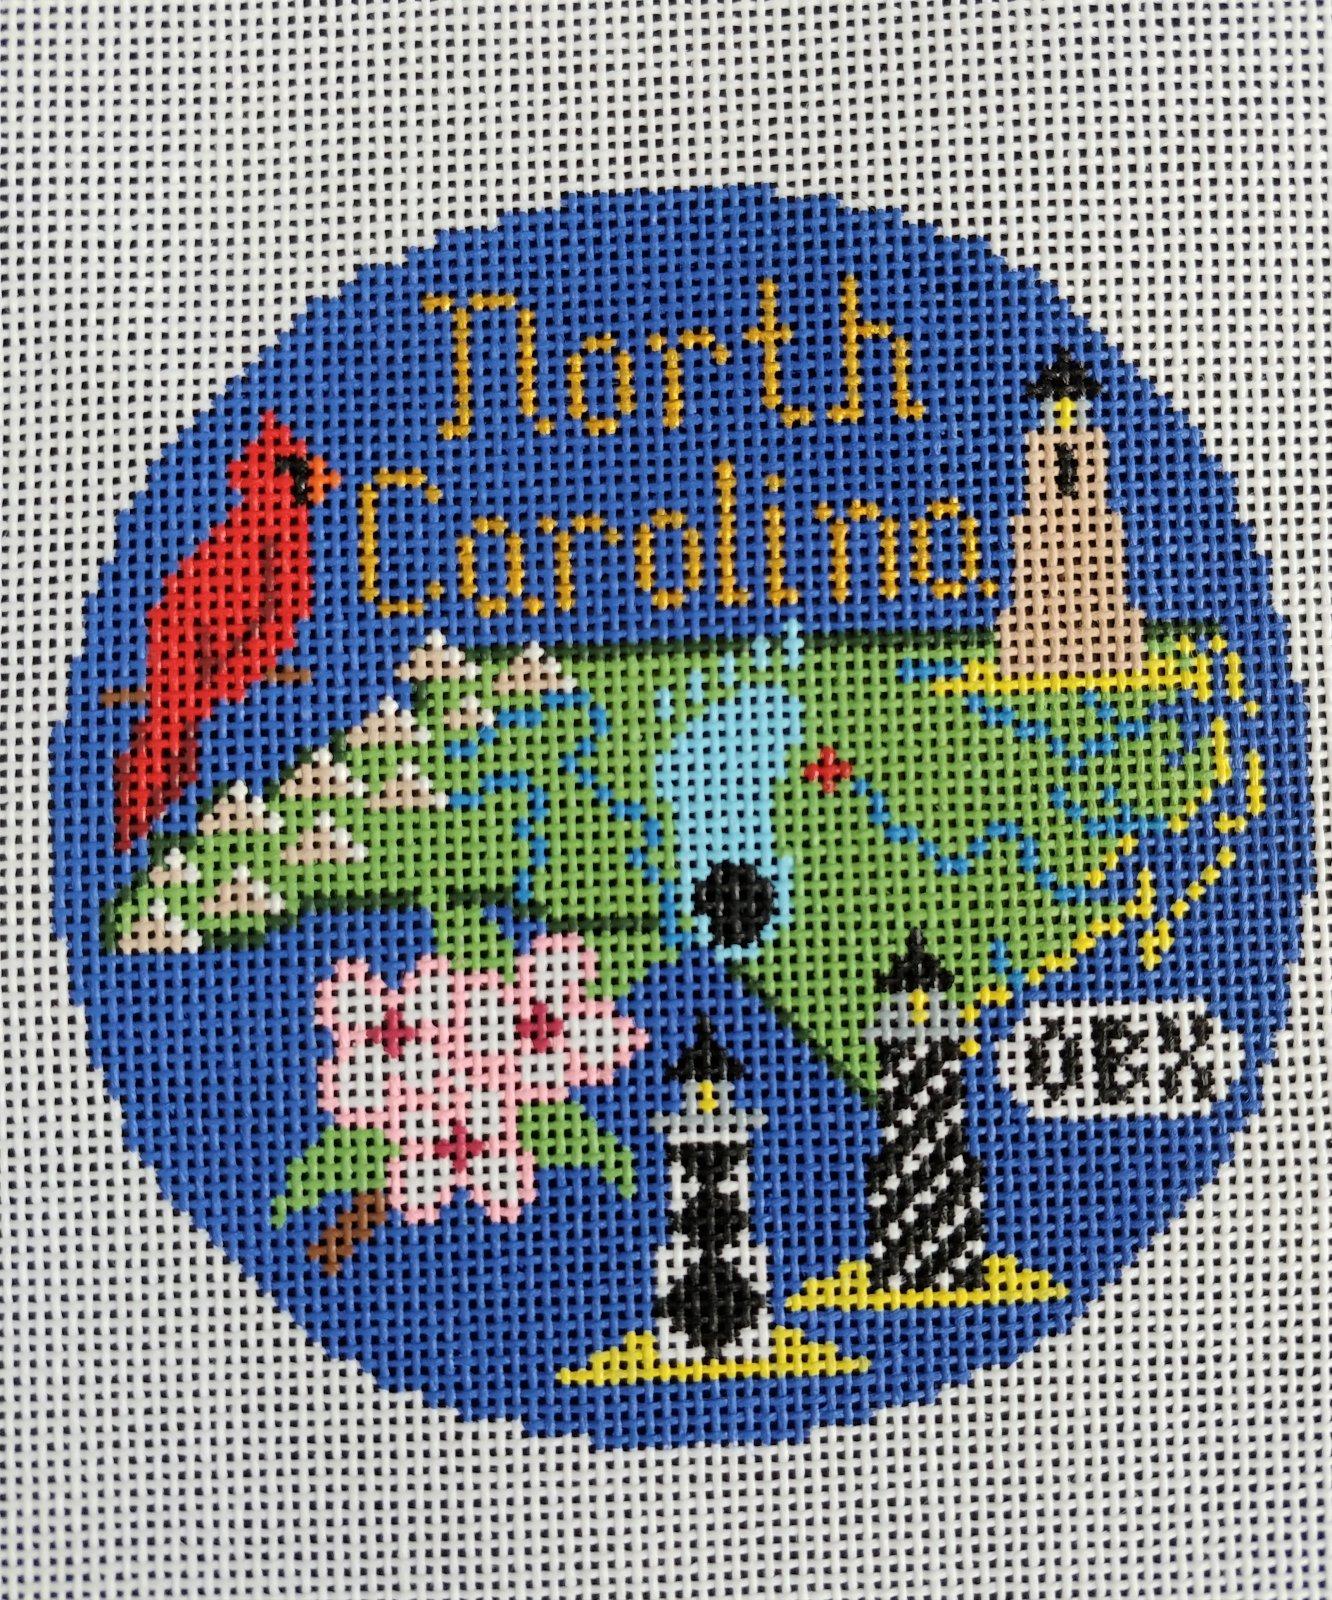 Silver Needle 683 North Carolina